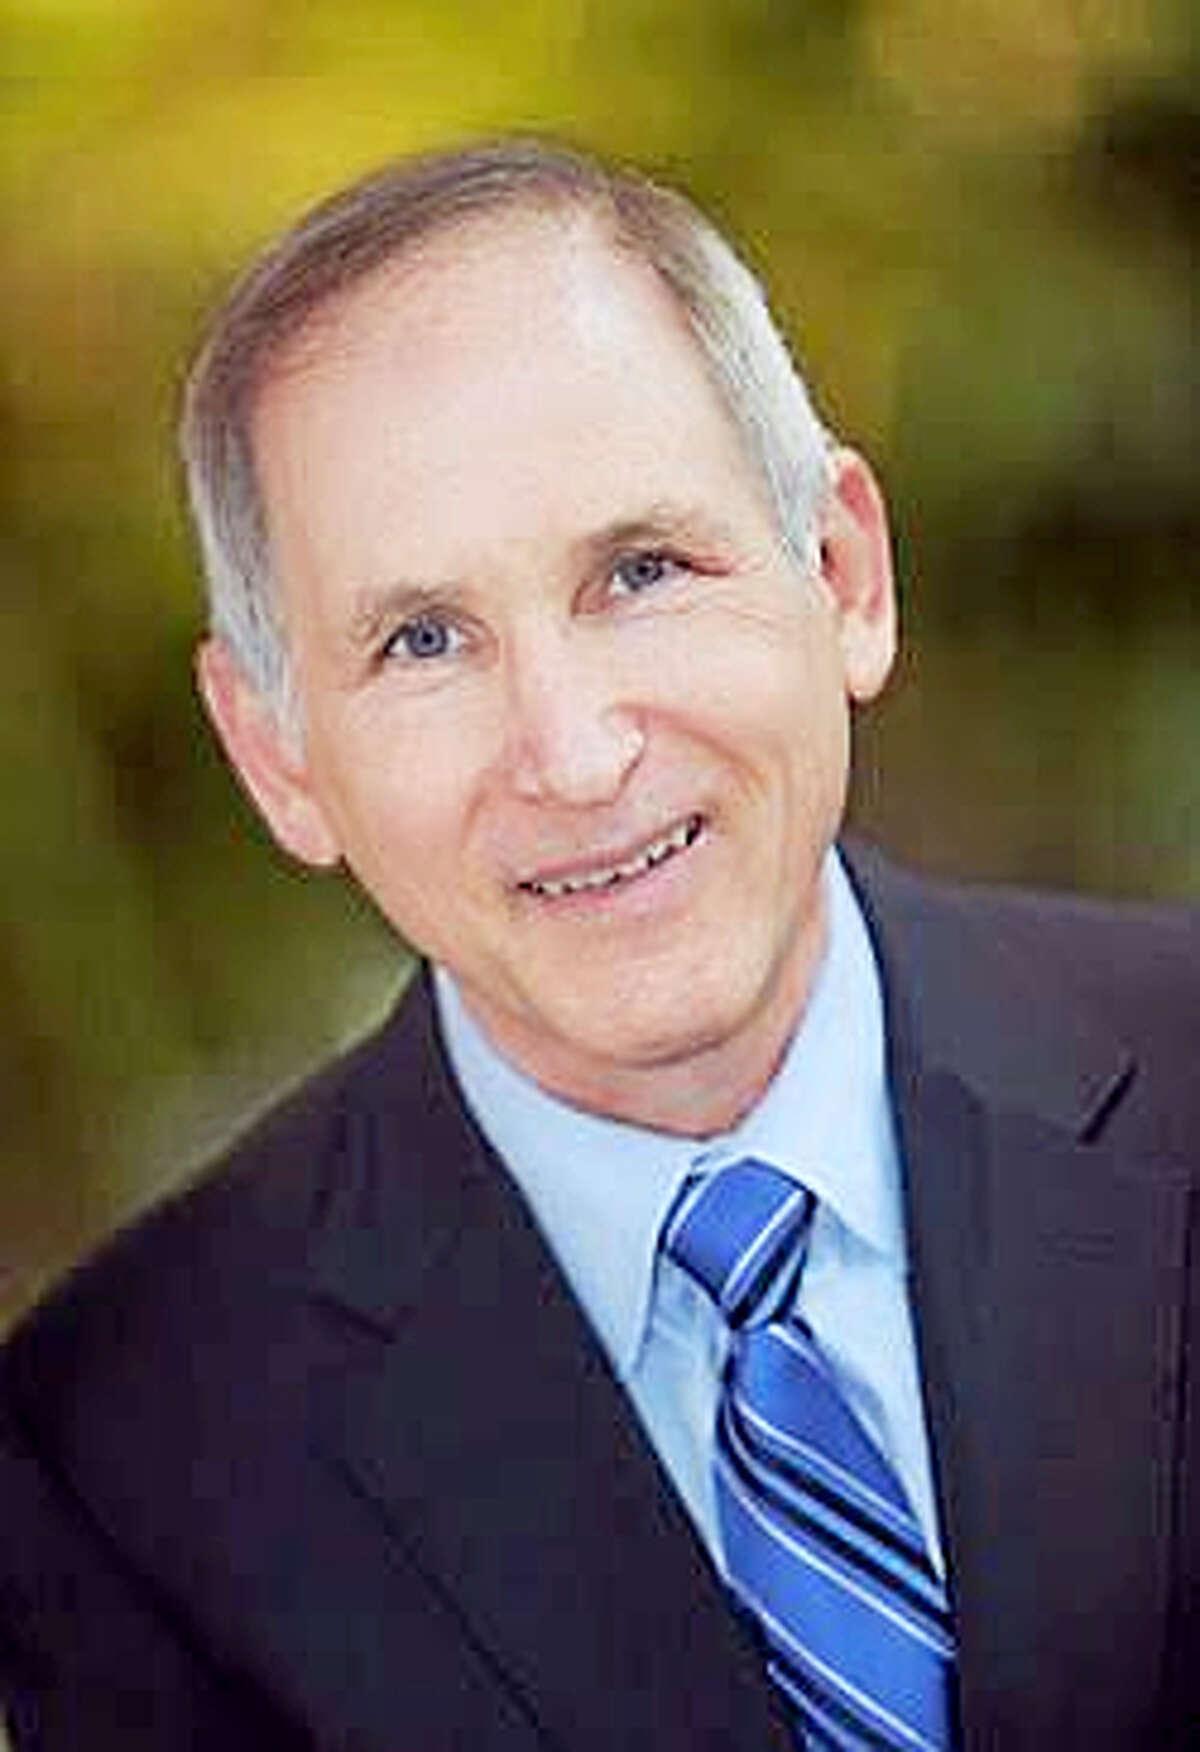 COURTESY YALE NEW HAVEN HOSPITALDr. Charles Fuchs